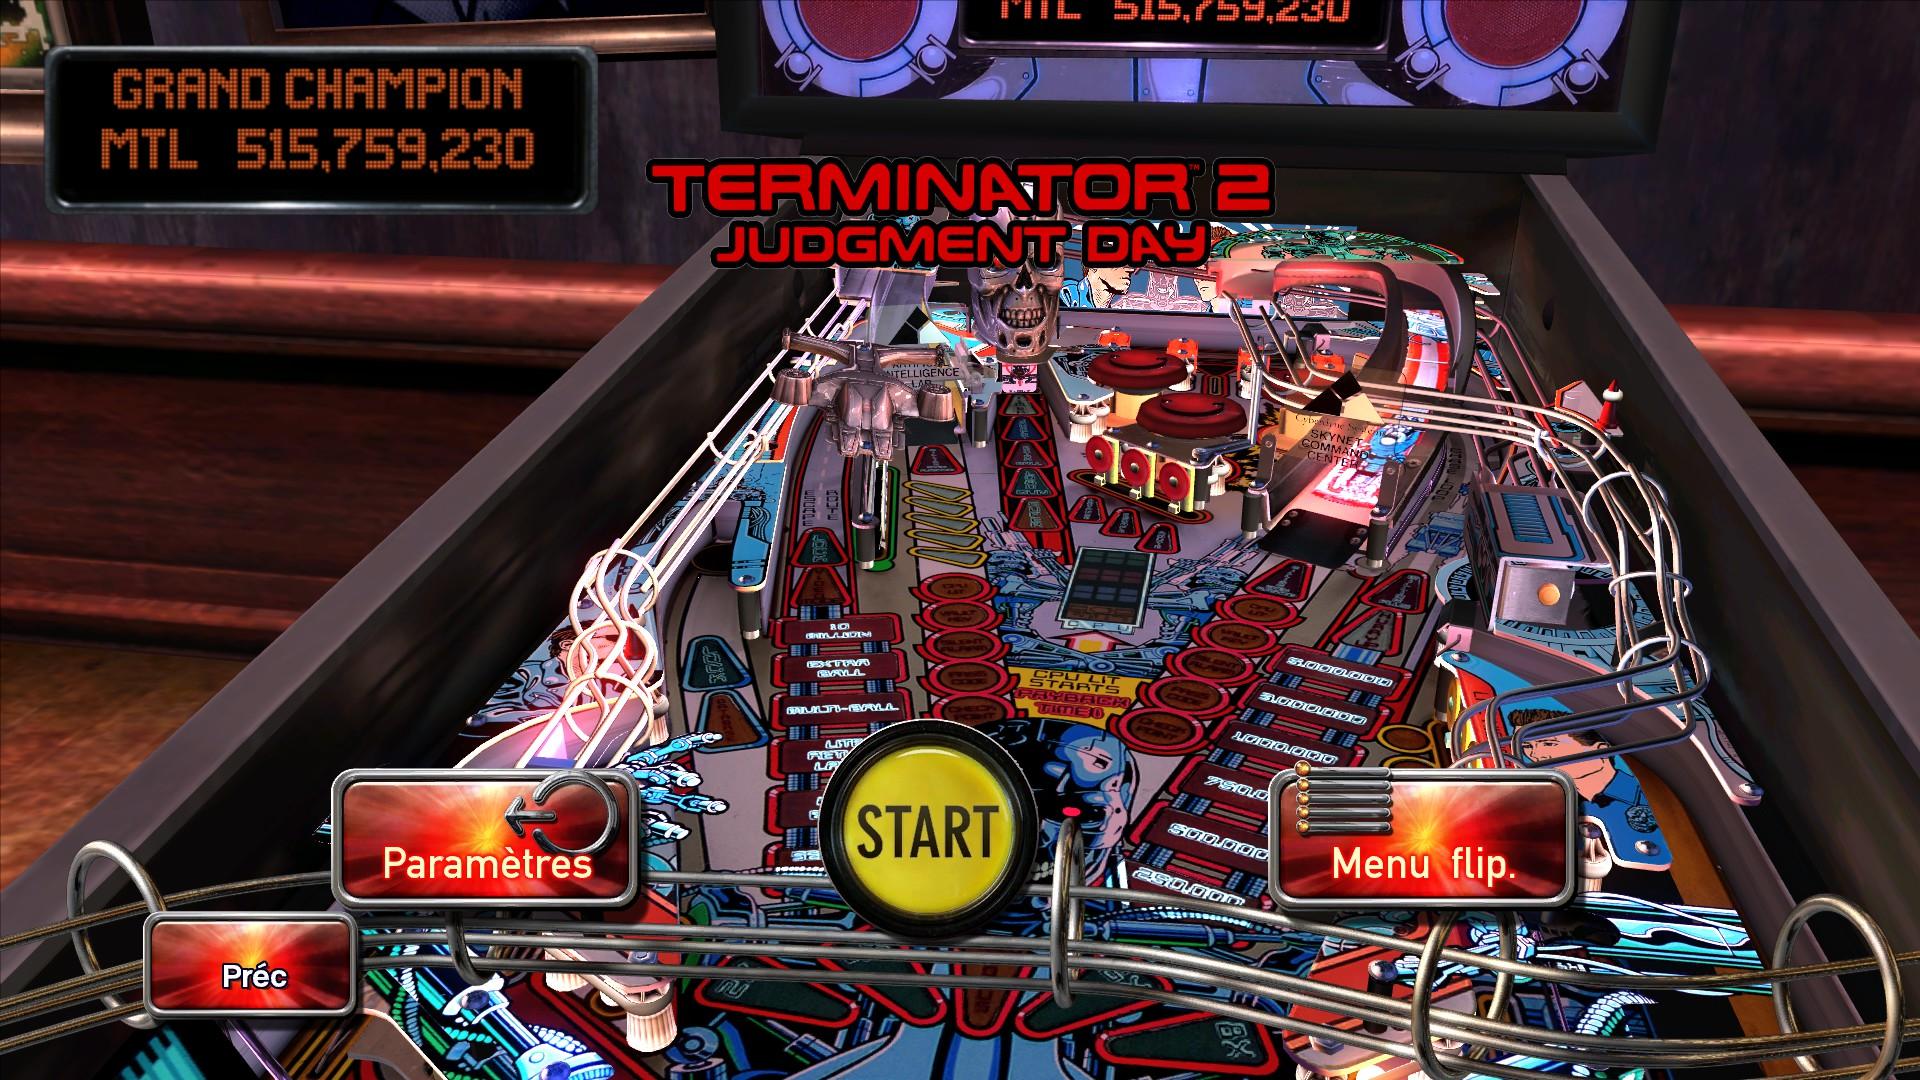 Mantalow: Pinball Arcade: Terminator 2 (PC) 515,759,230 points on 2015-09-25 05:07:50